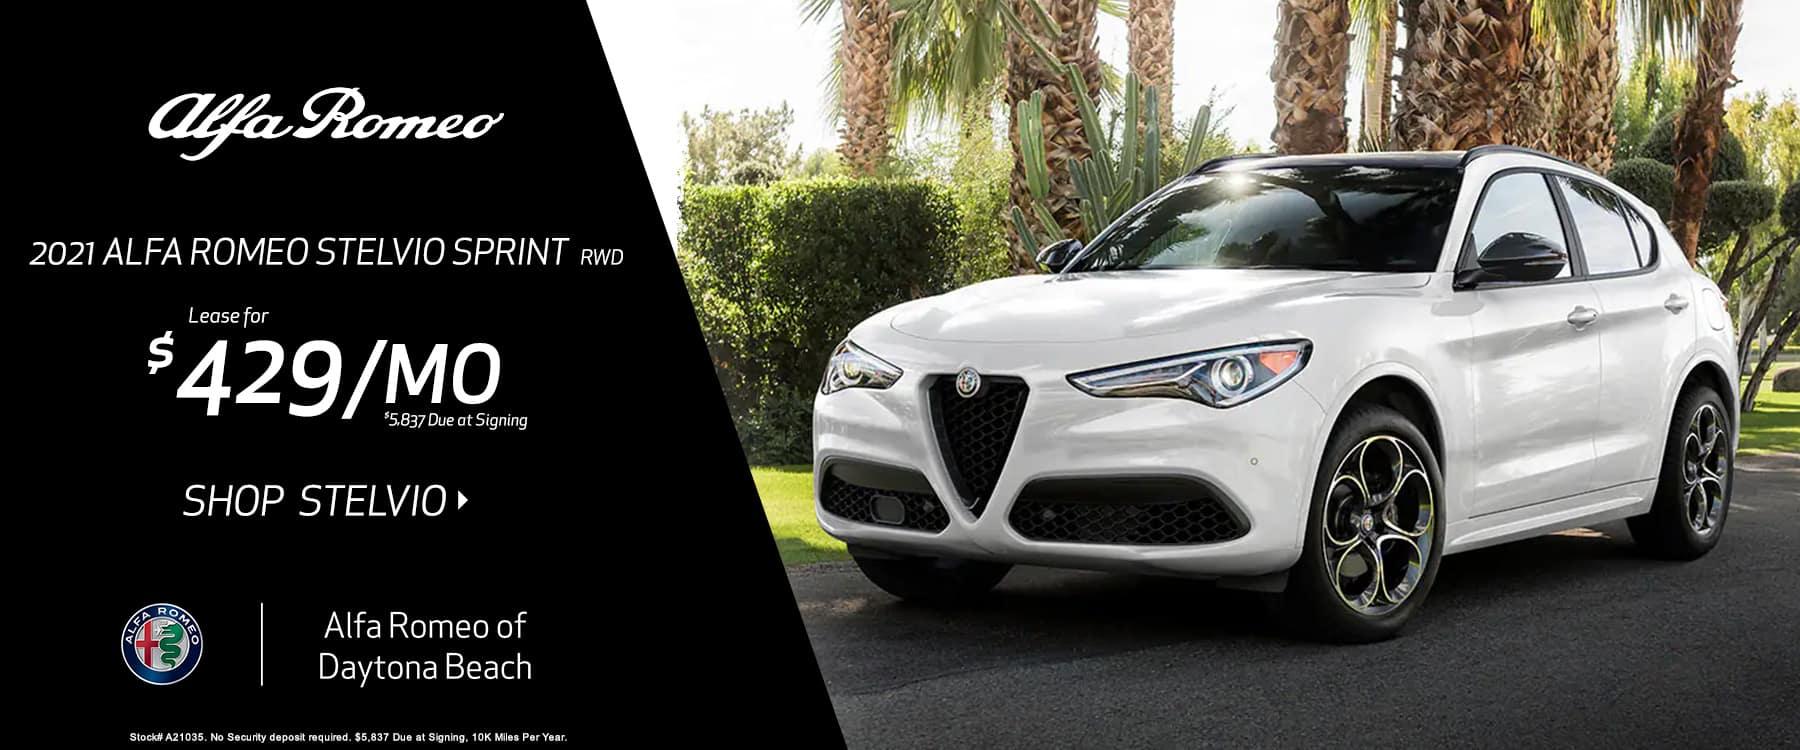 DMAR-2110-Alfa-Romeo-1800×750-02